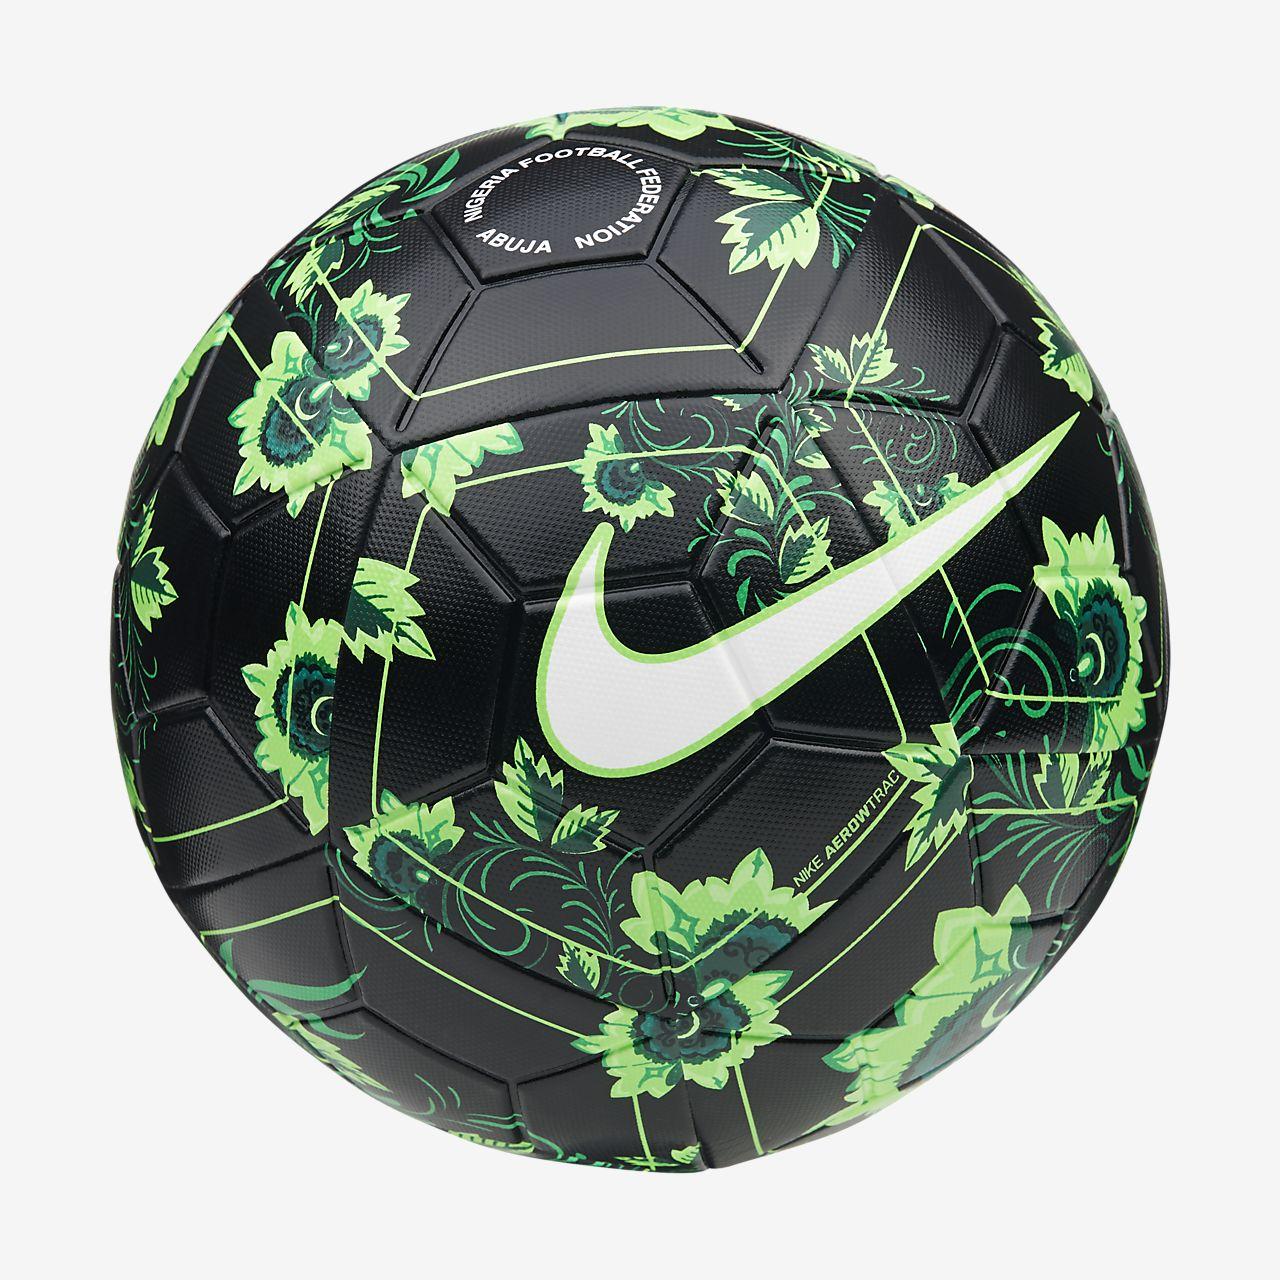 Nigeria Magia Soccer Ball Nike